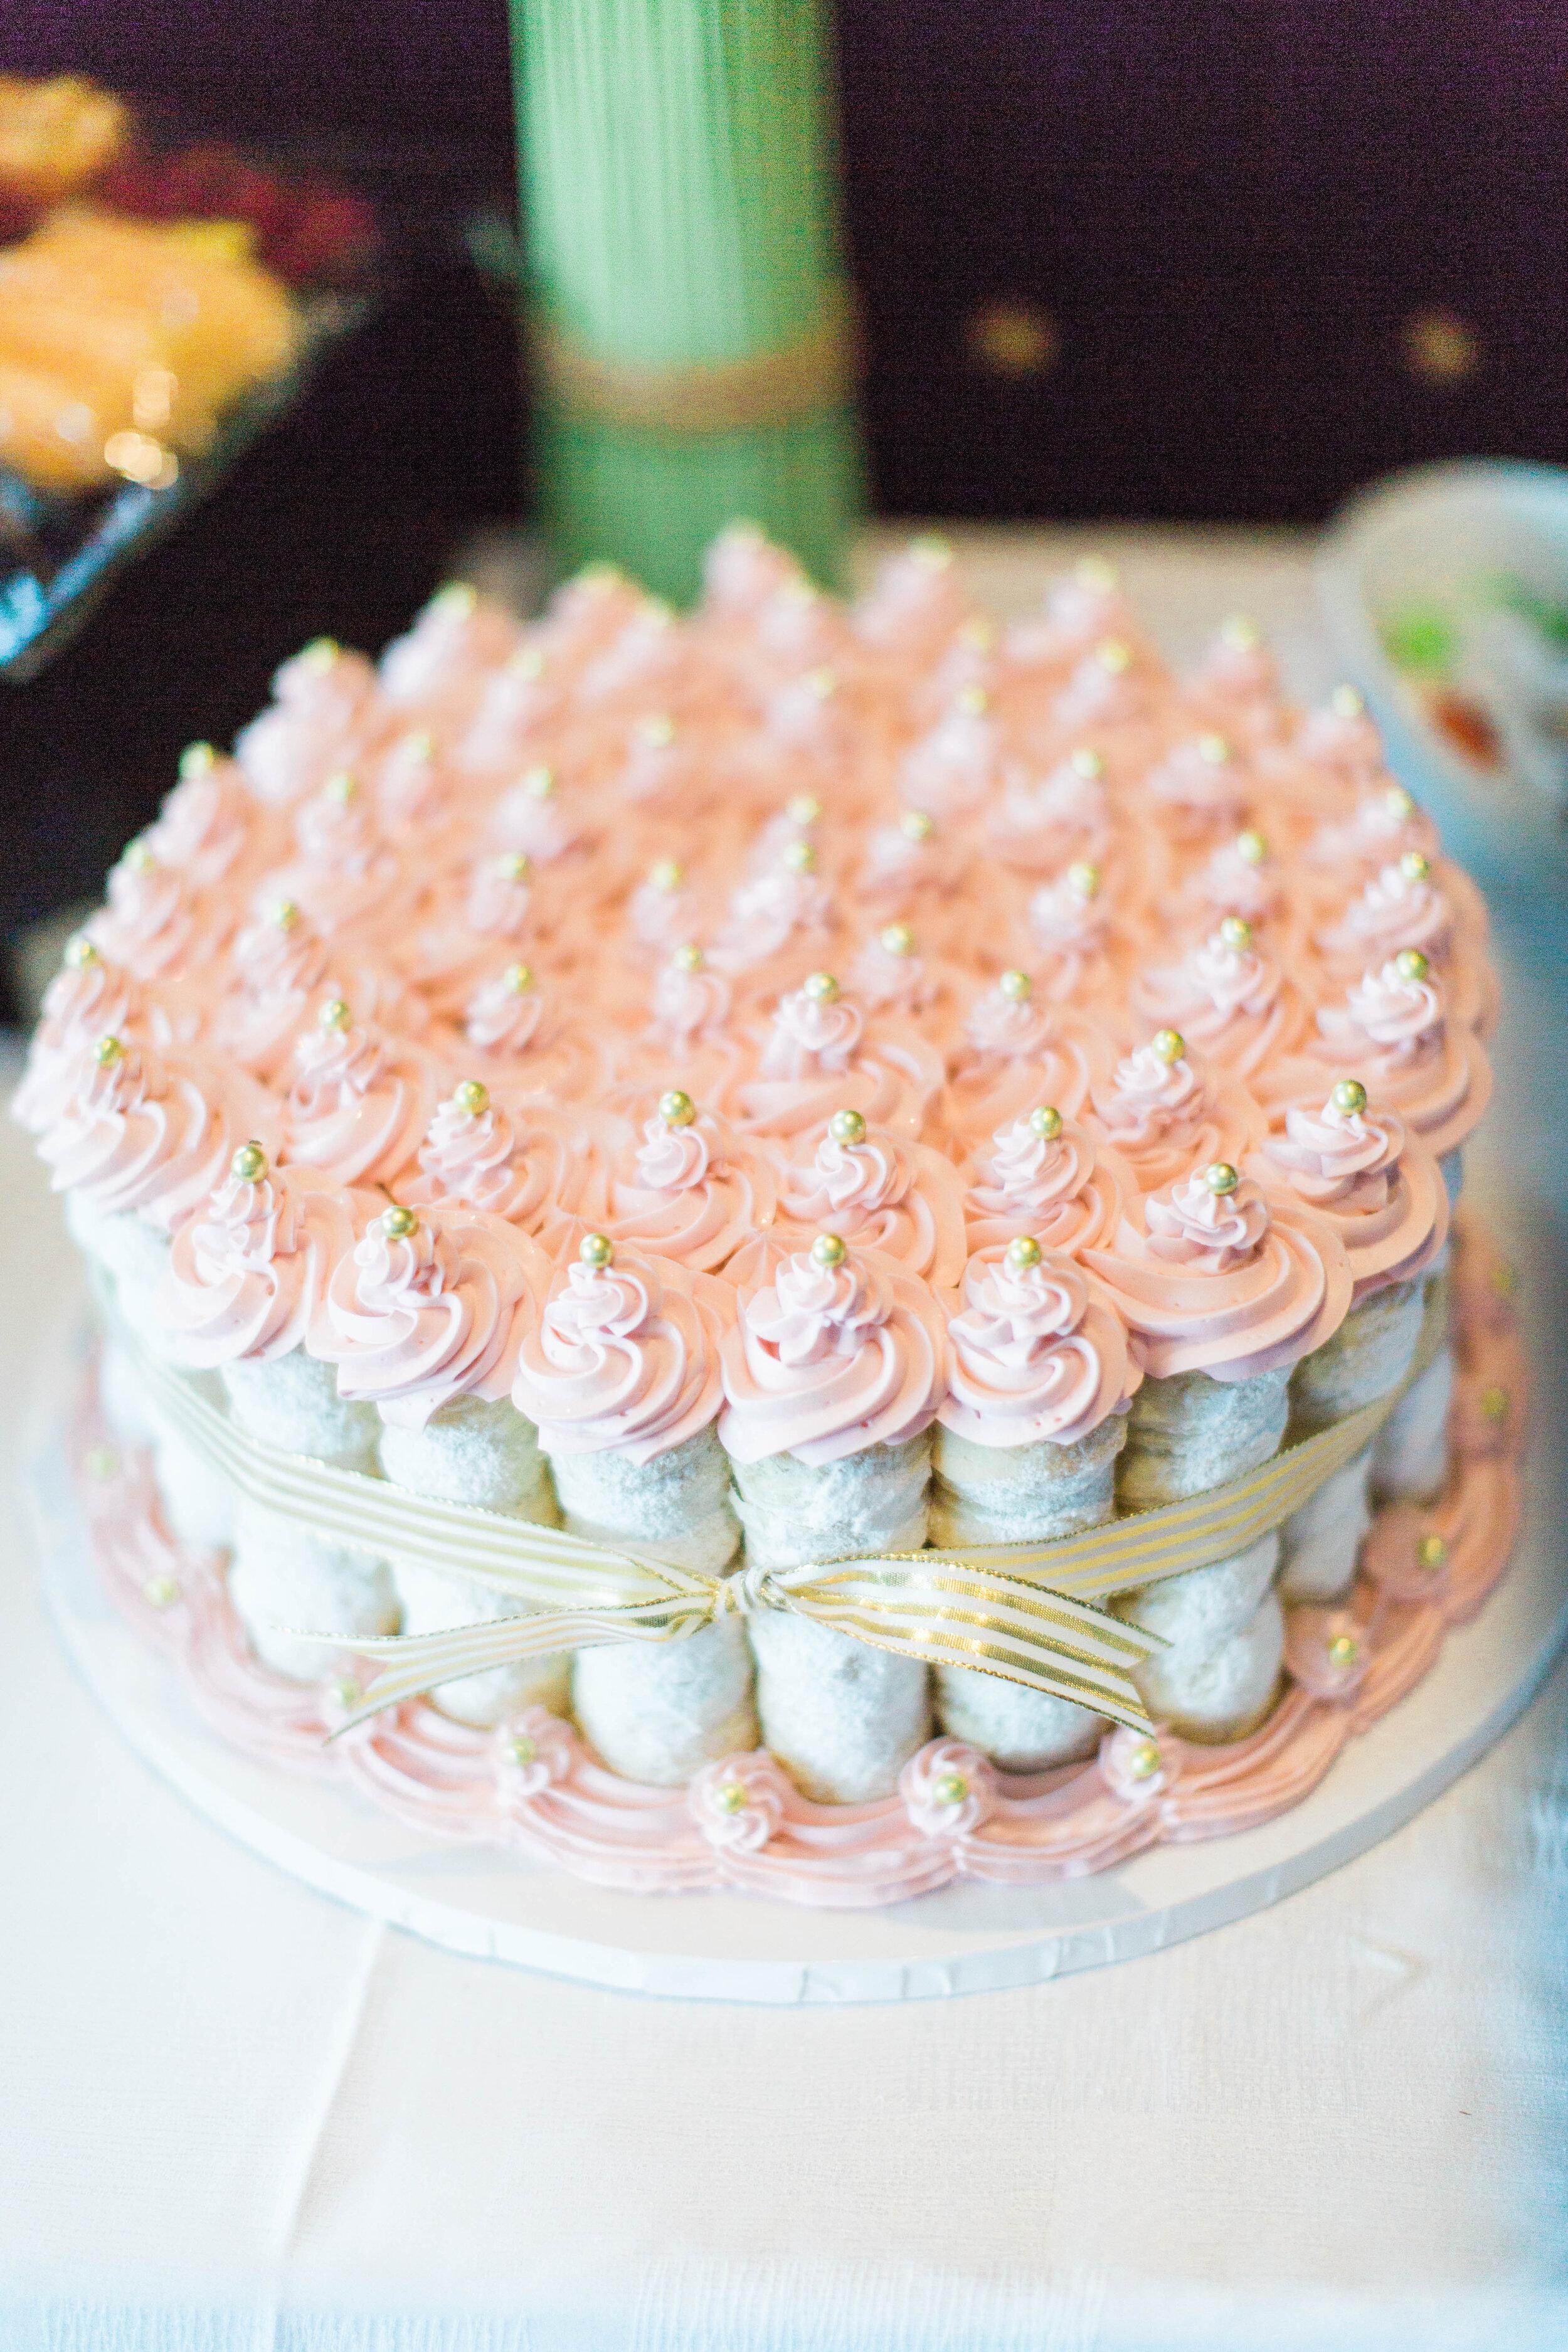 Pink cannoli wedding cake - Trendy Modern Brunch Wedding - Historia Wedding and Event Planning